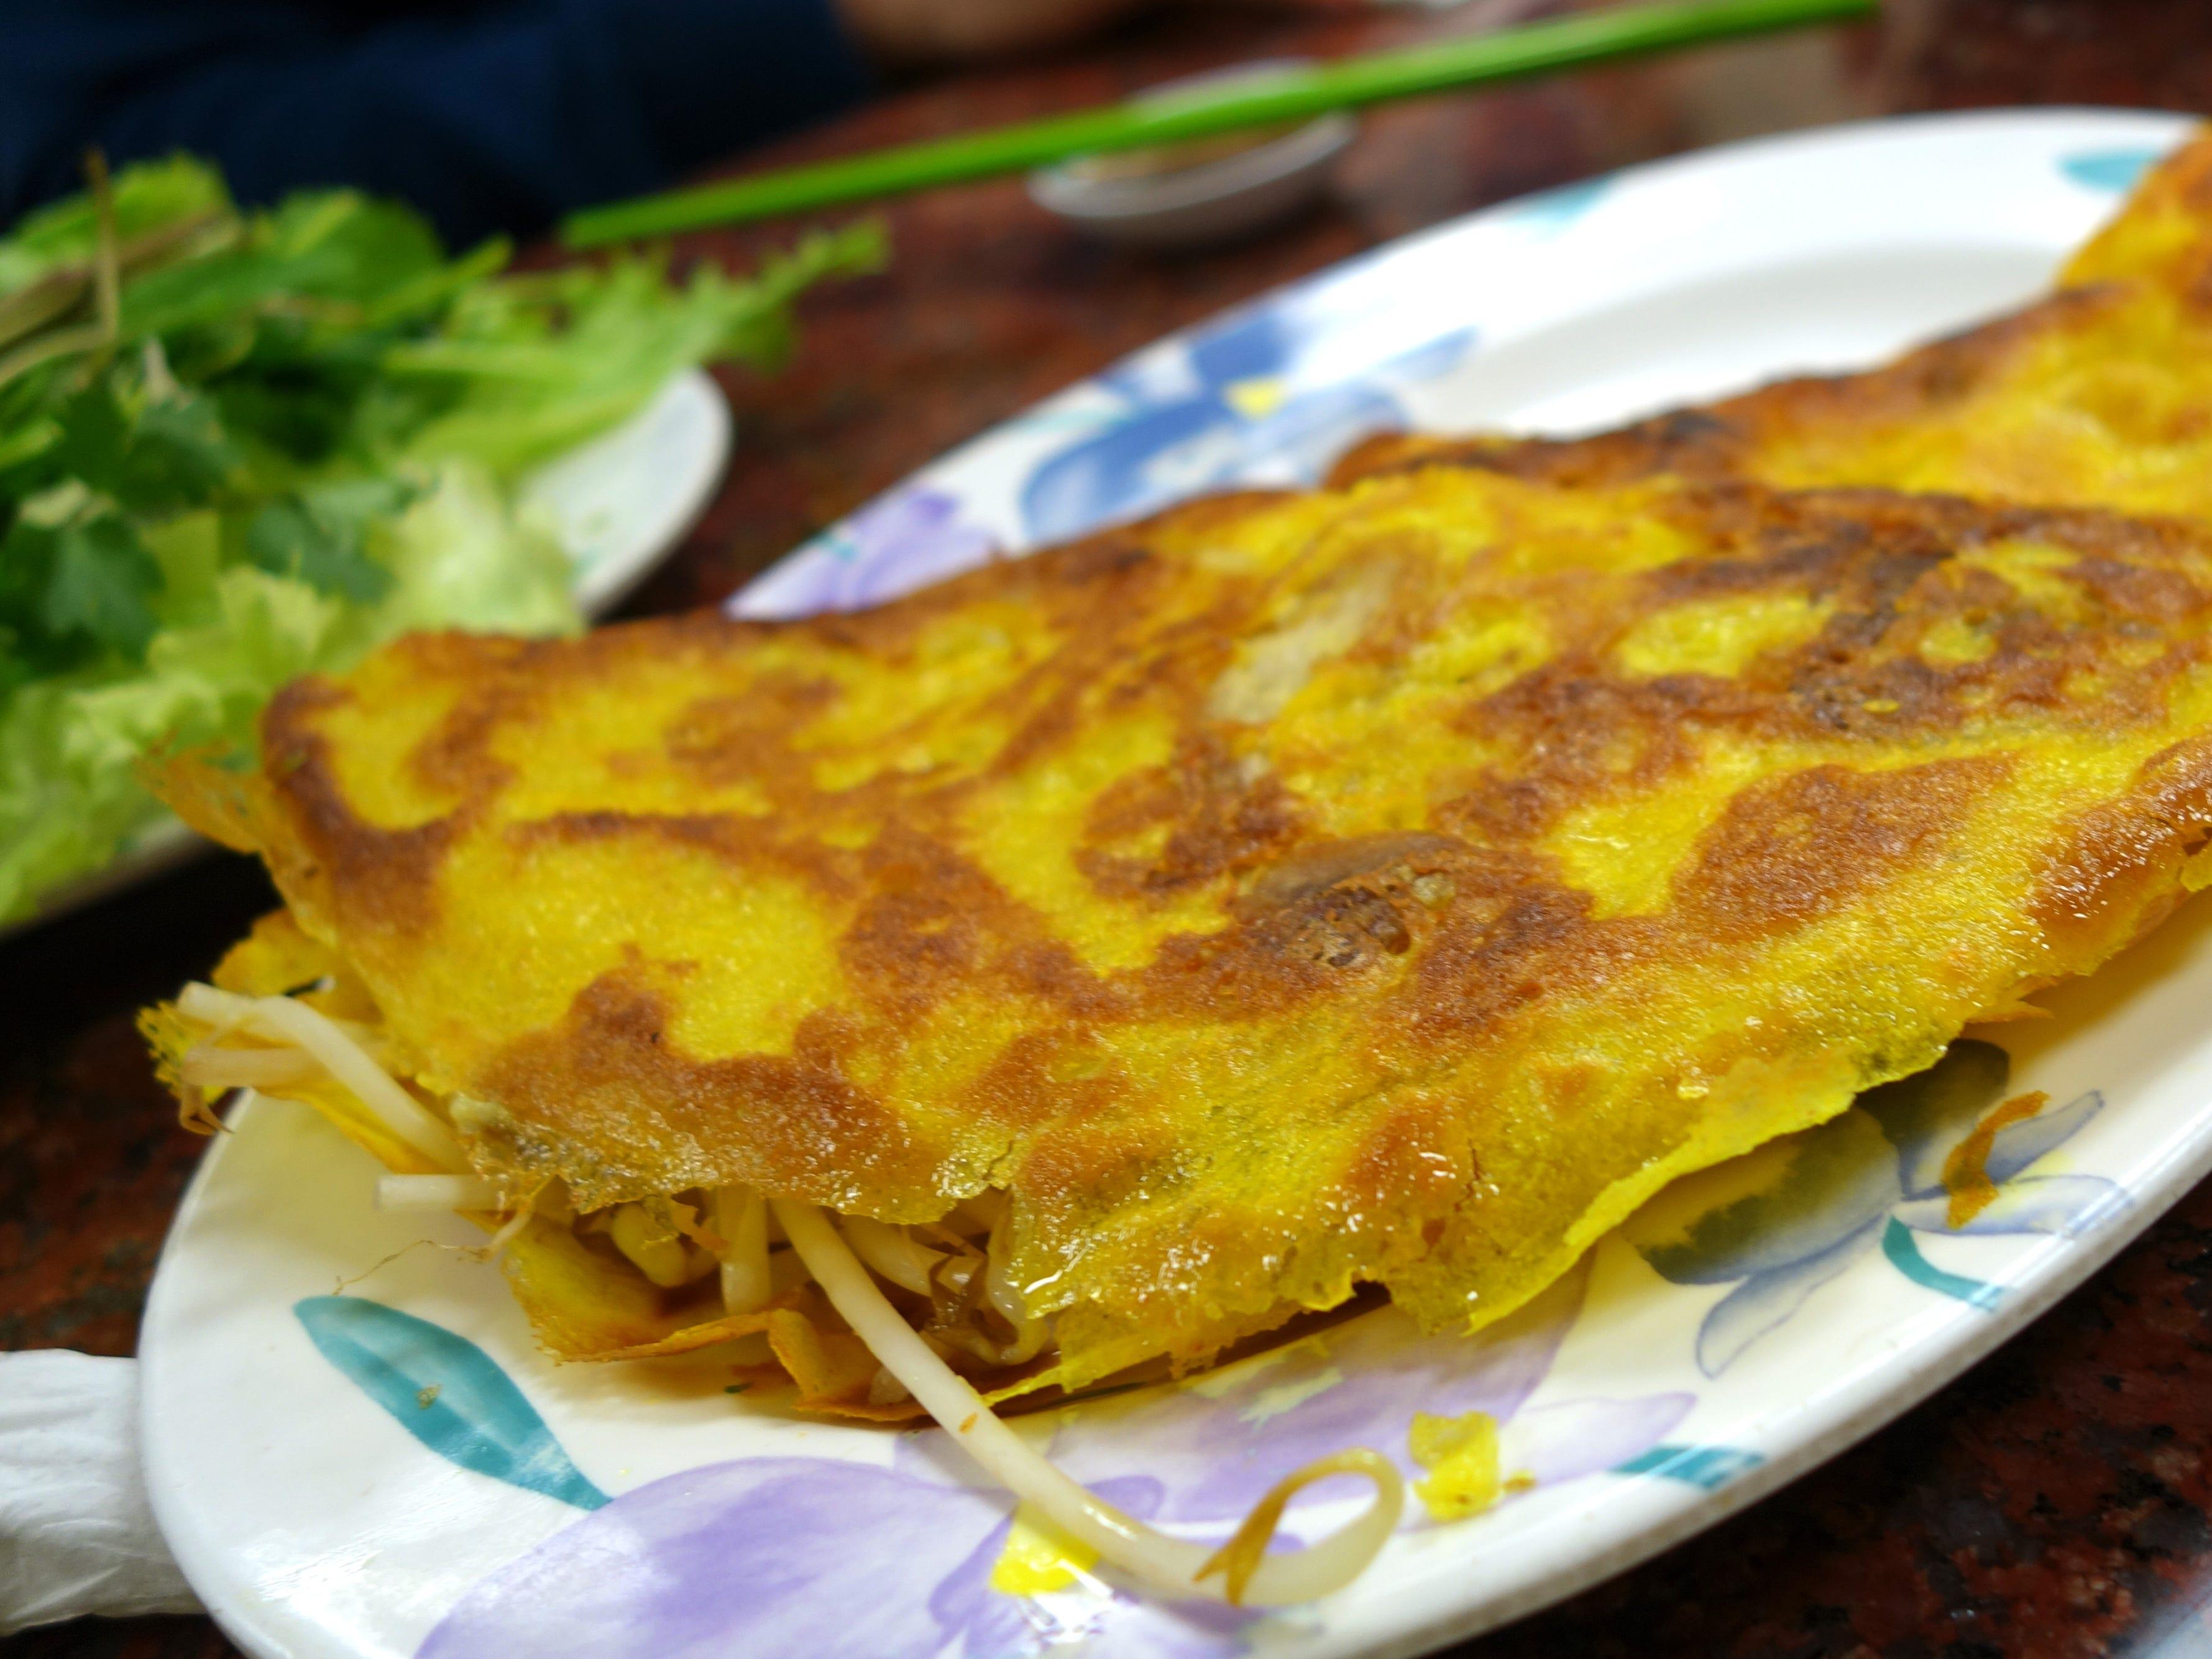 Banh xeo (pan-fried rice crepe) at Pho Thanh in Phoenix, AZ.